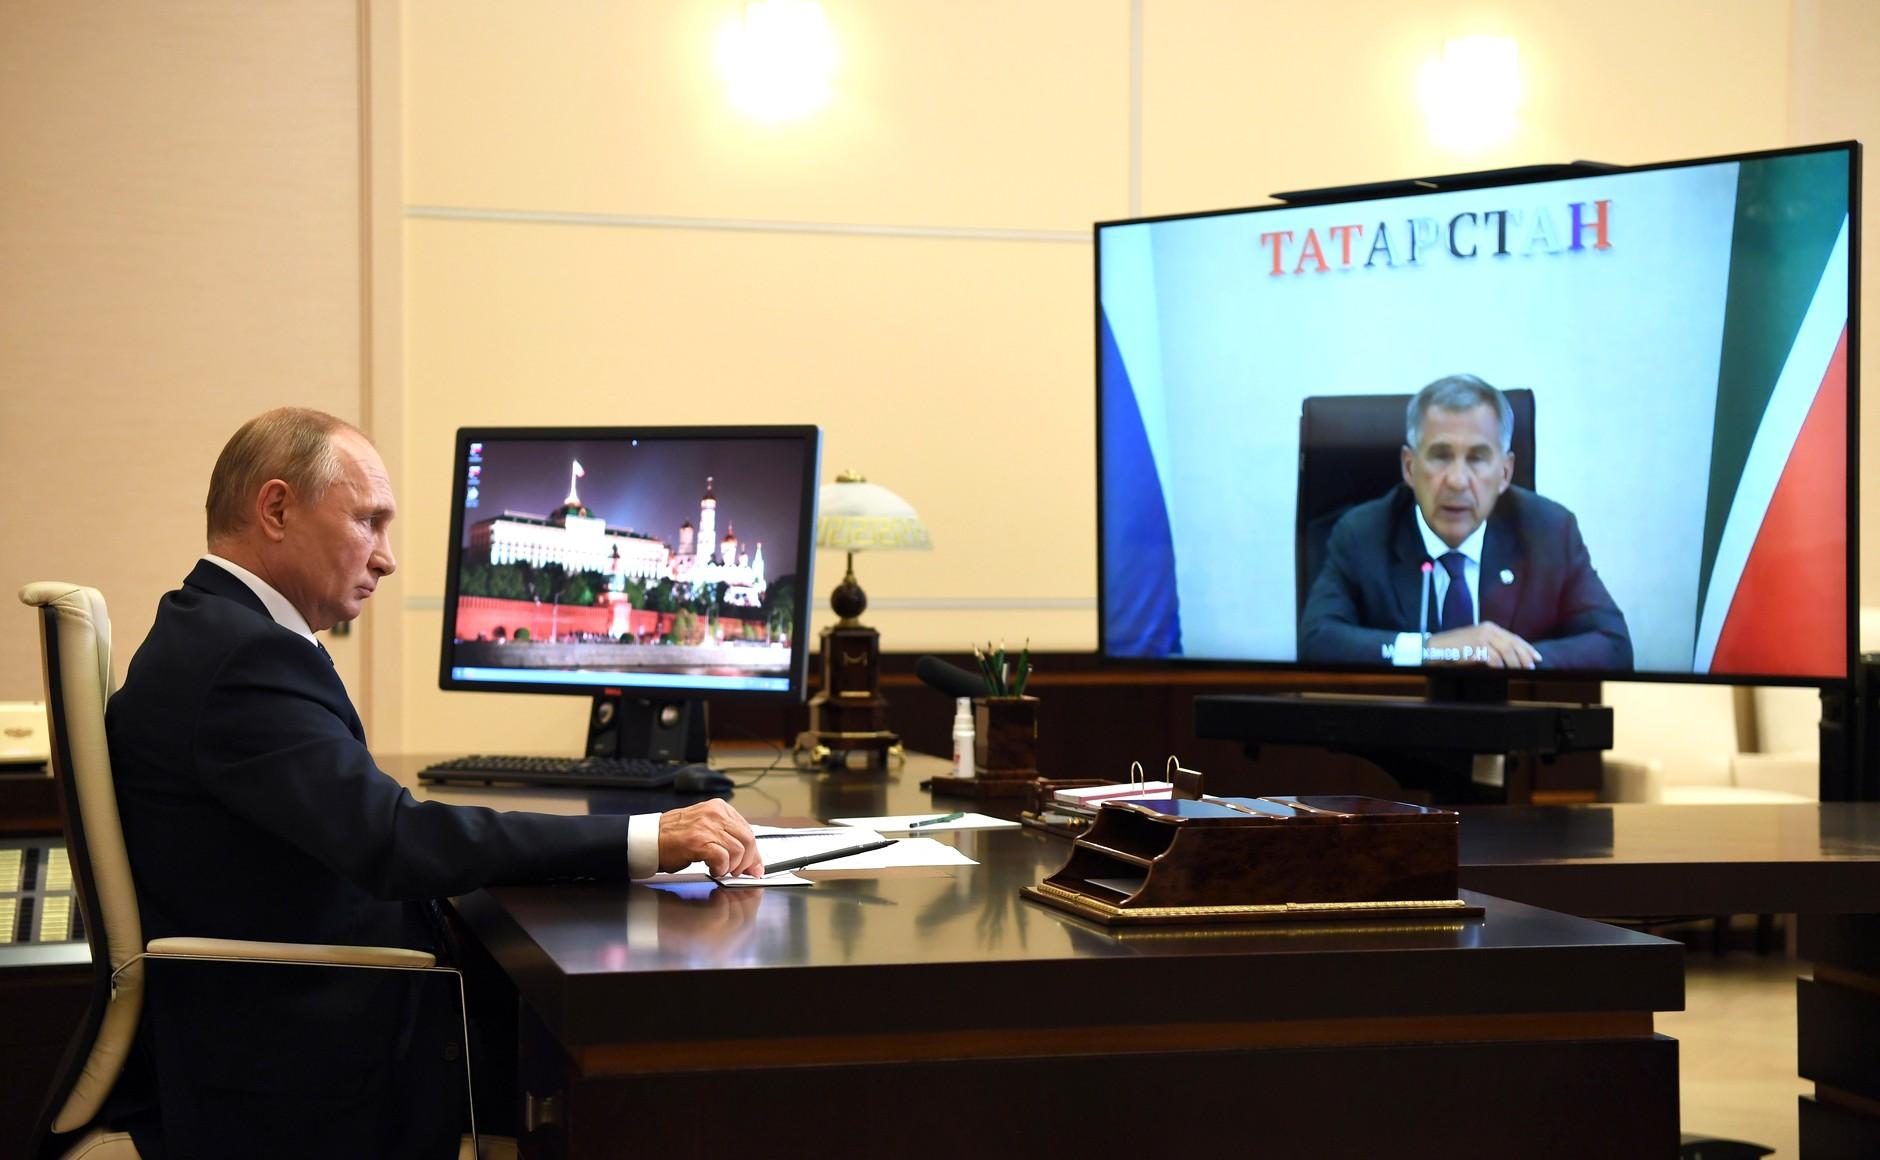 kremlin 1 X 3 DU 28.08.2020 Réunion de travail avec le chef du Tatarstan Rustam Minnikhanov (par vidéoconférence). x7yu7lkmwJ0wwl31wzadeCpALrAjxCWZ